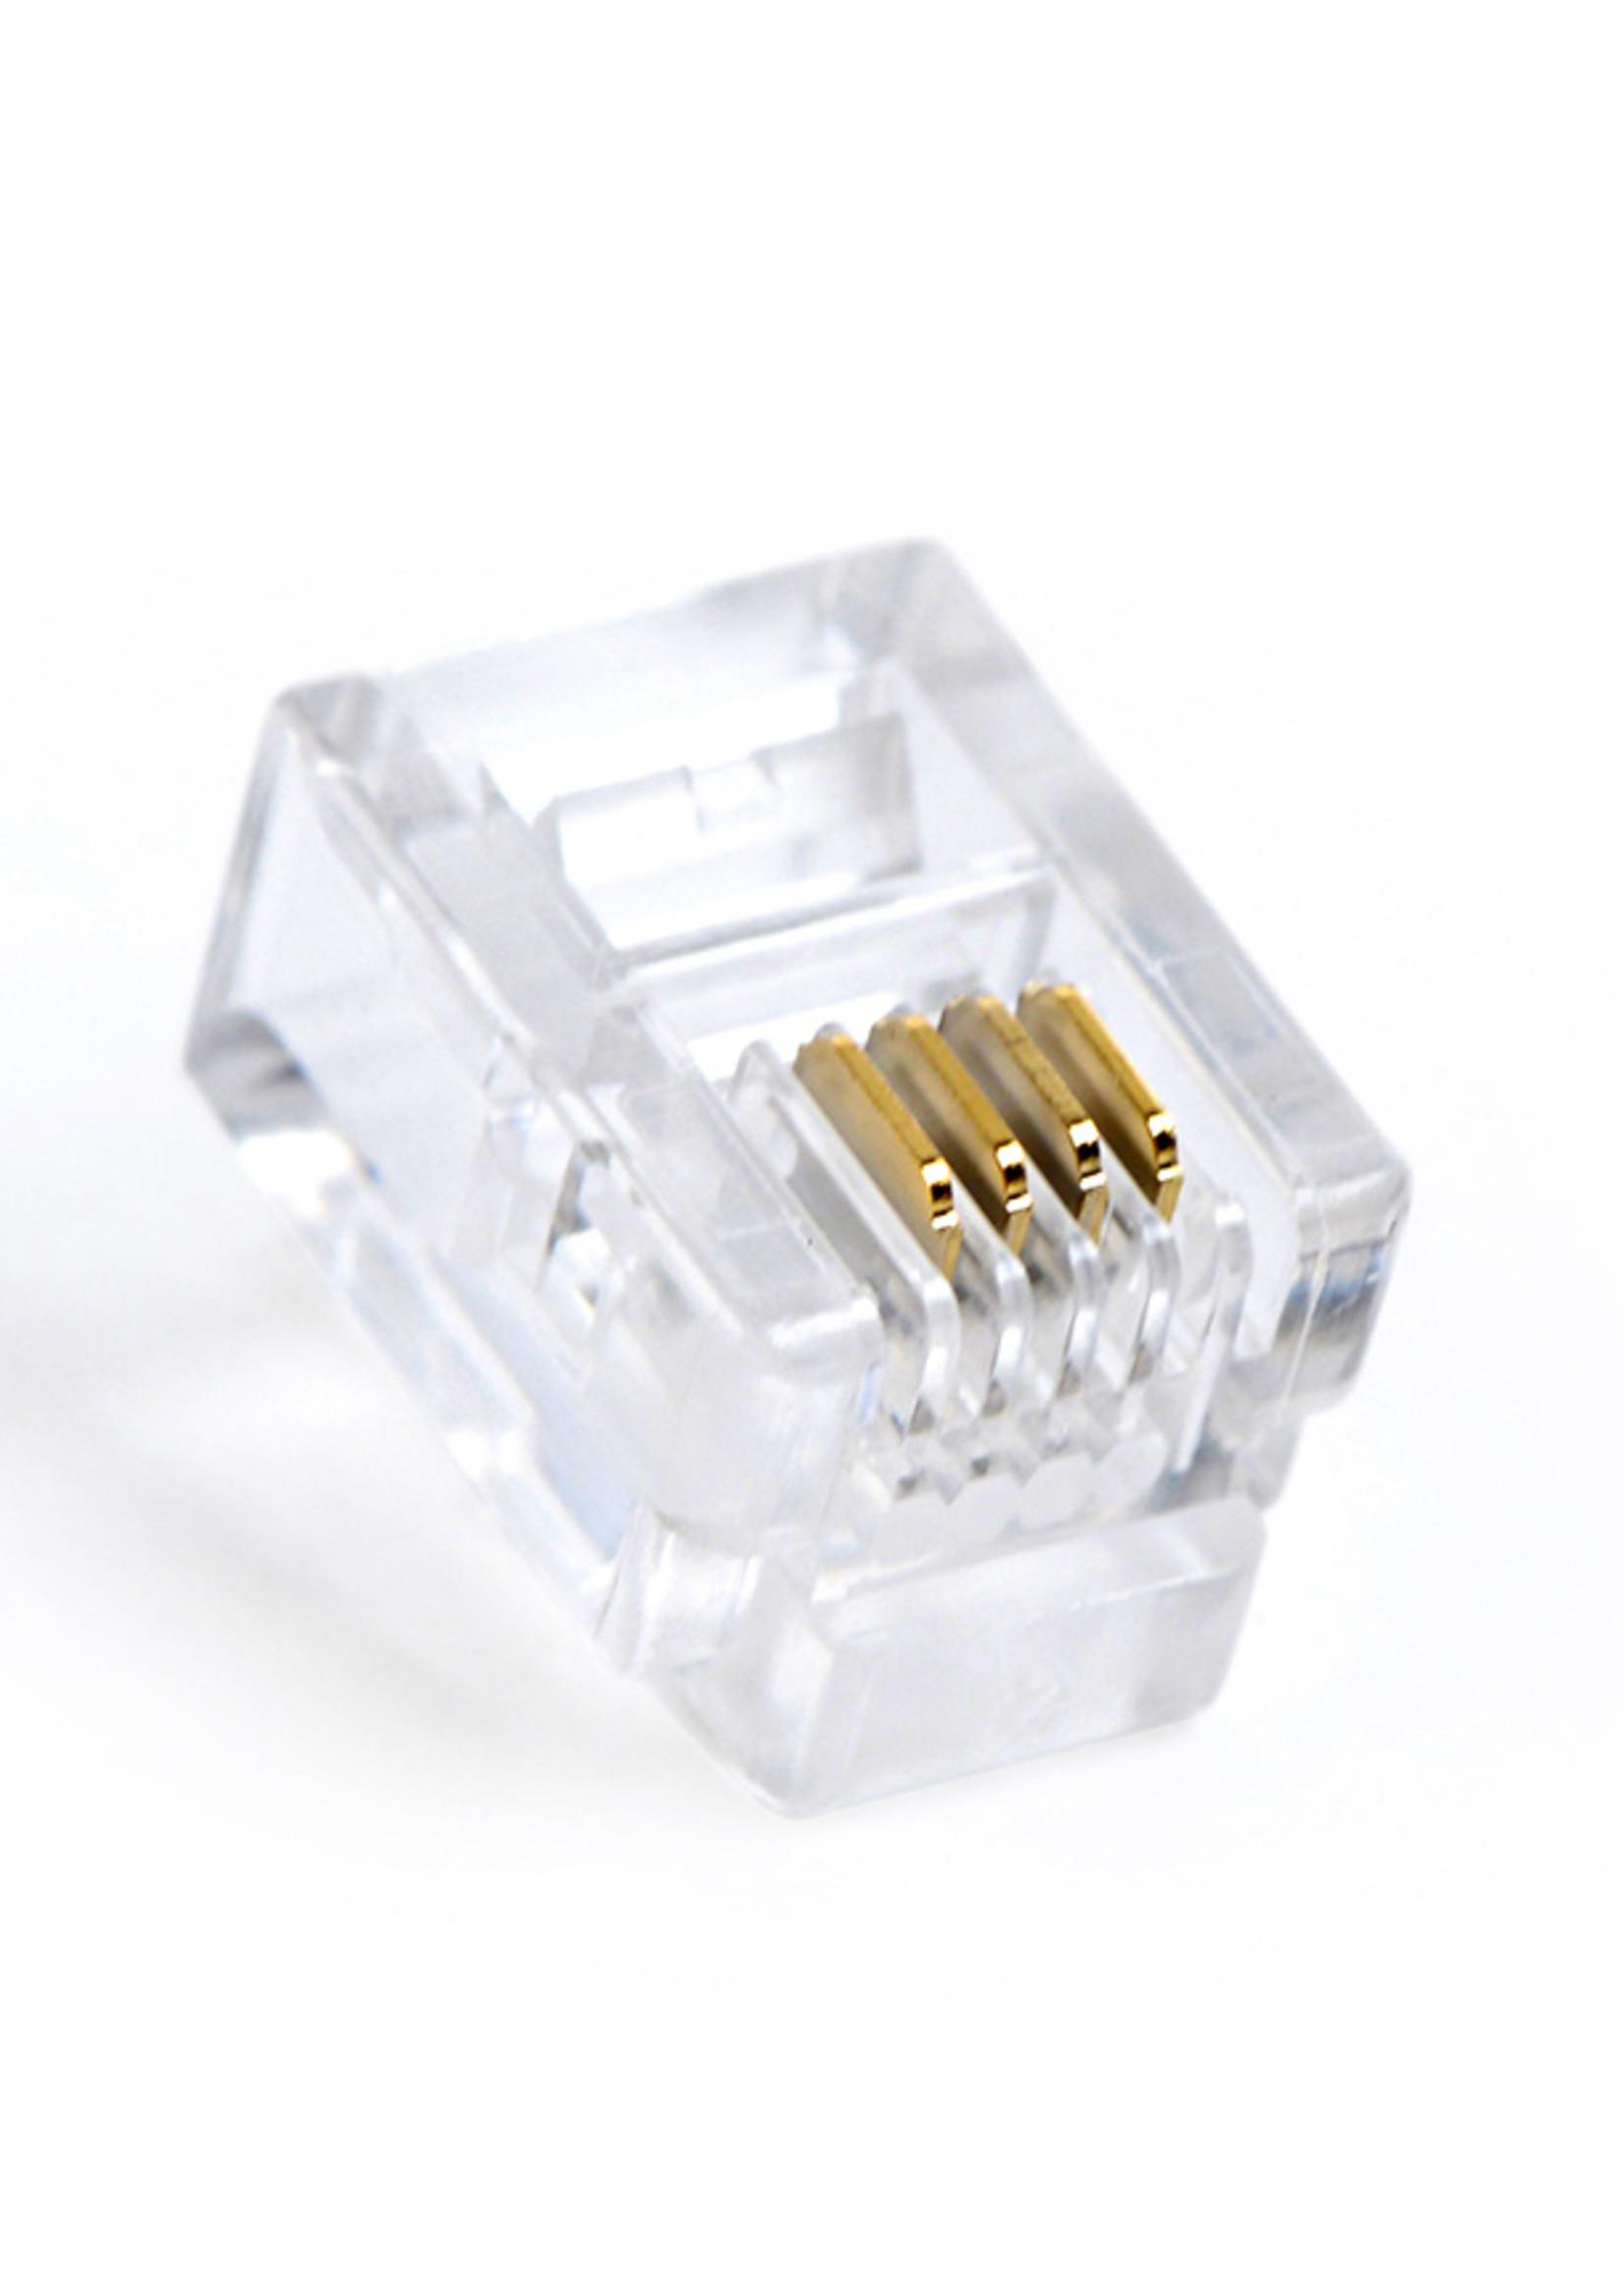 CableXpert Modulaire plug 6P4C (15u'), per 100 stuks